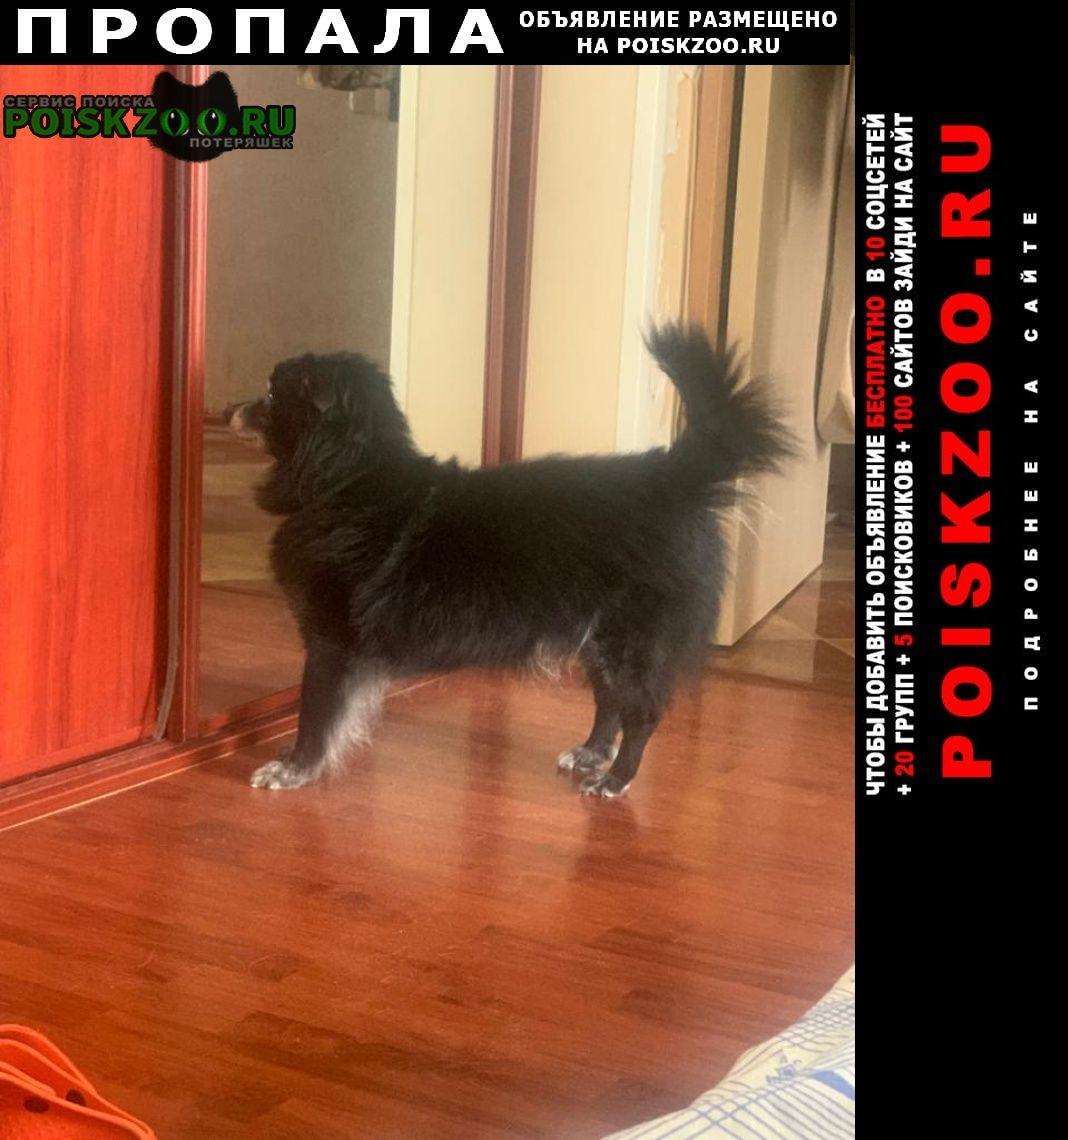 Пропала собака кобель Нелидово